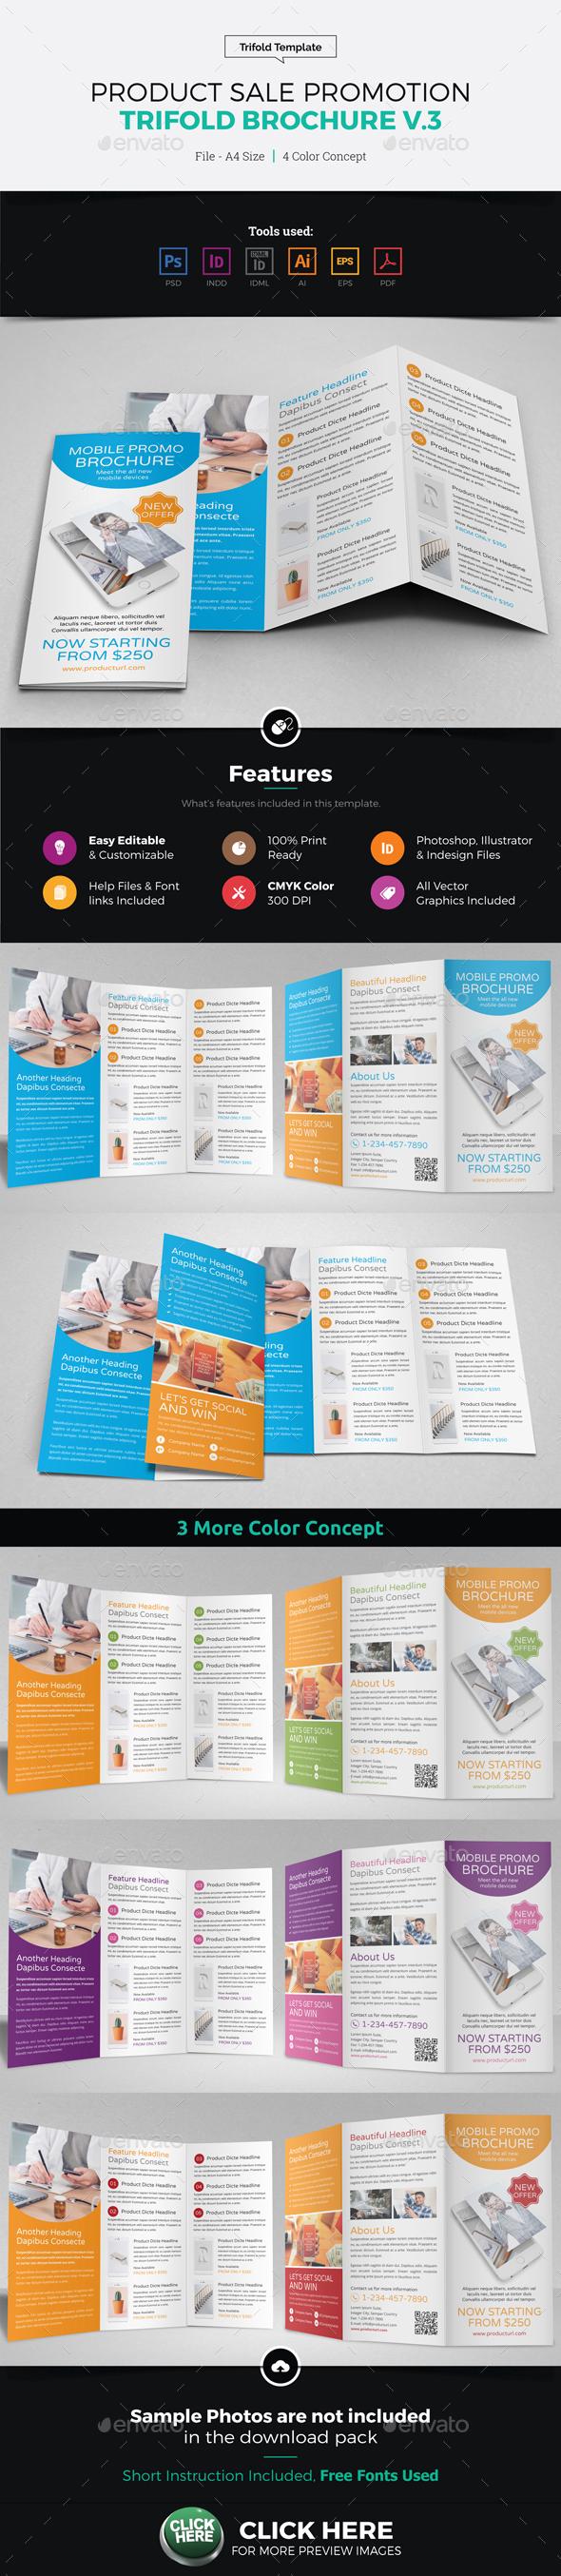 Product Sale Promotion Trifold Brochure v3 - Corporate Brochures